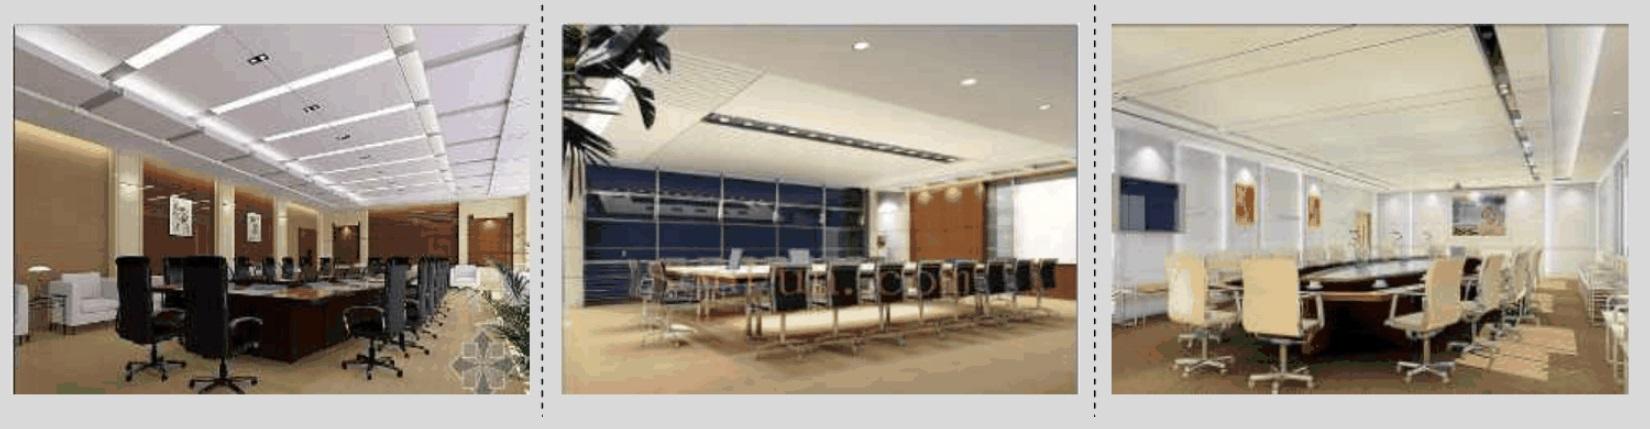 NTP同步时钟之会议室布置